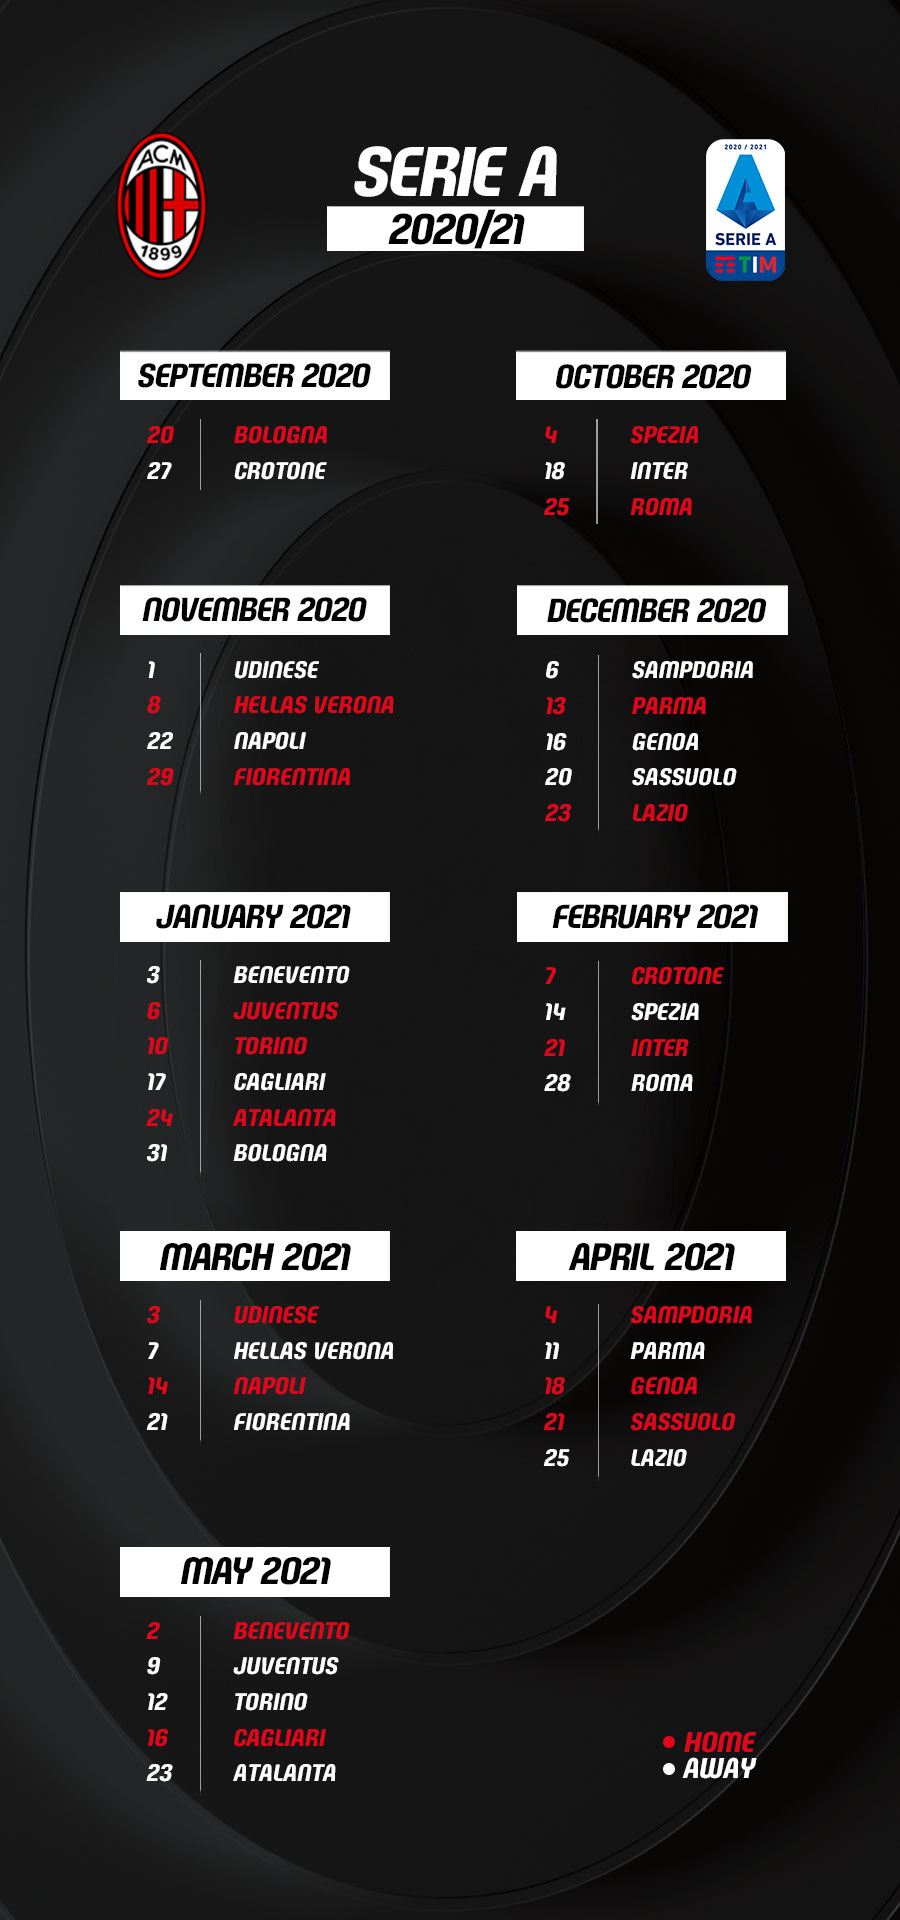 Serie A 2020/21 calendar: Milan start against Bologna, Crotone and